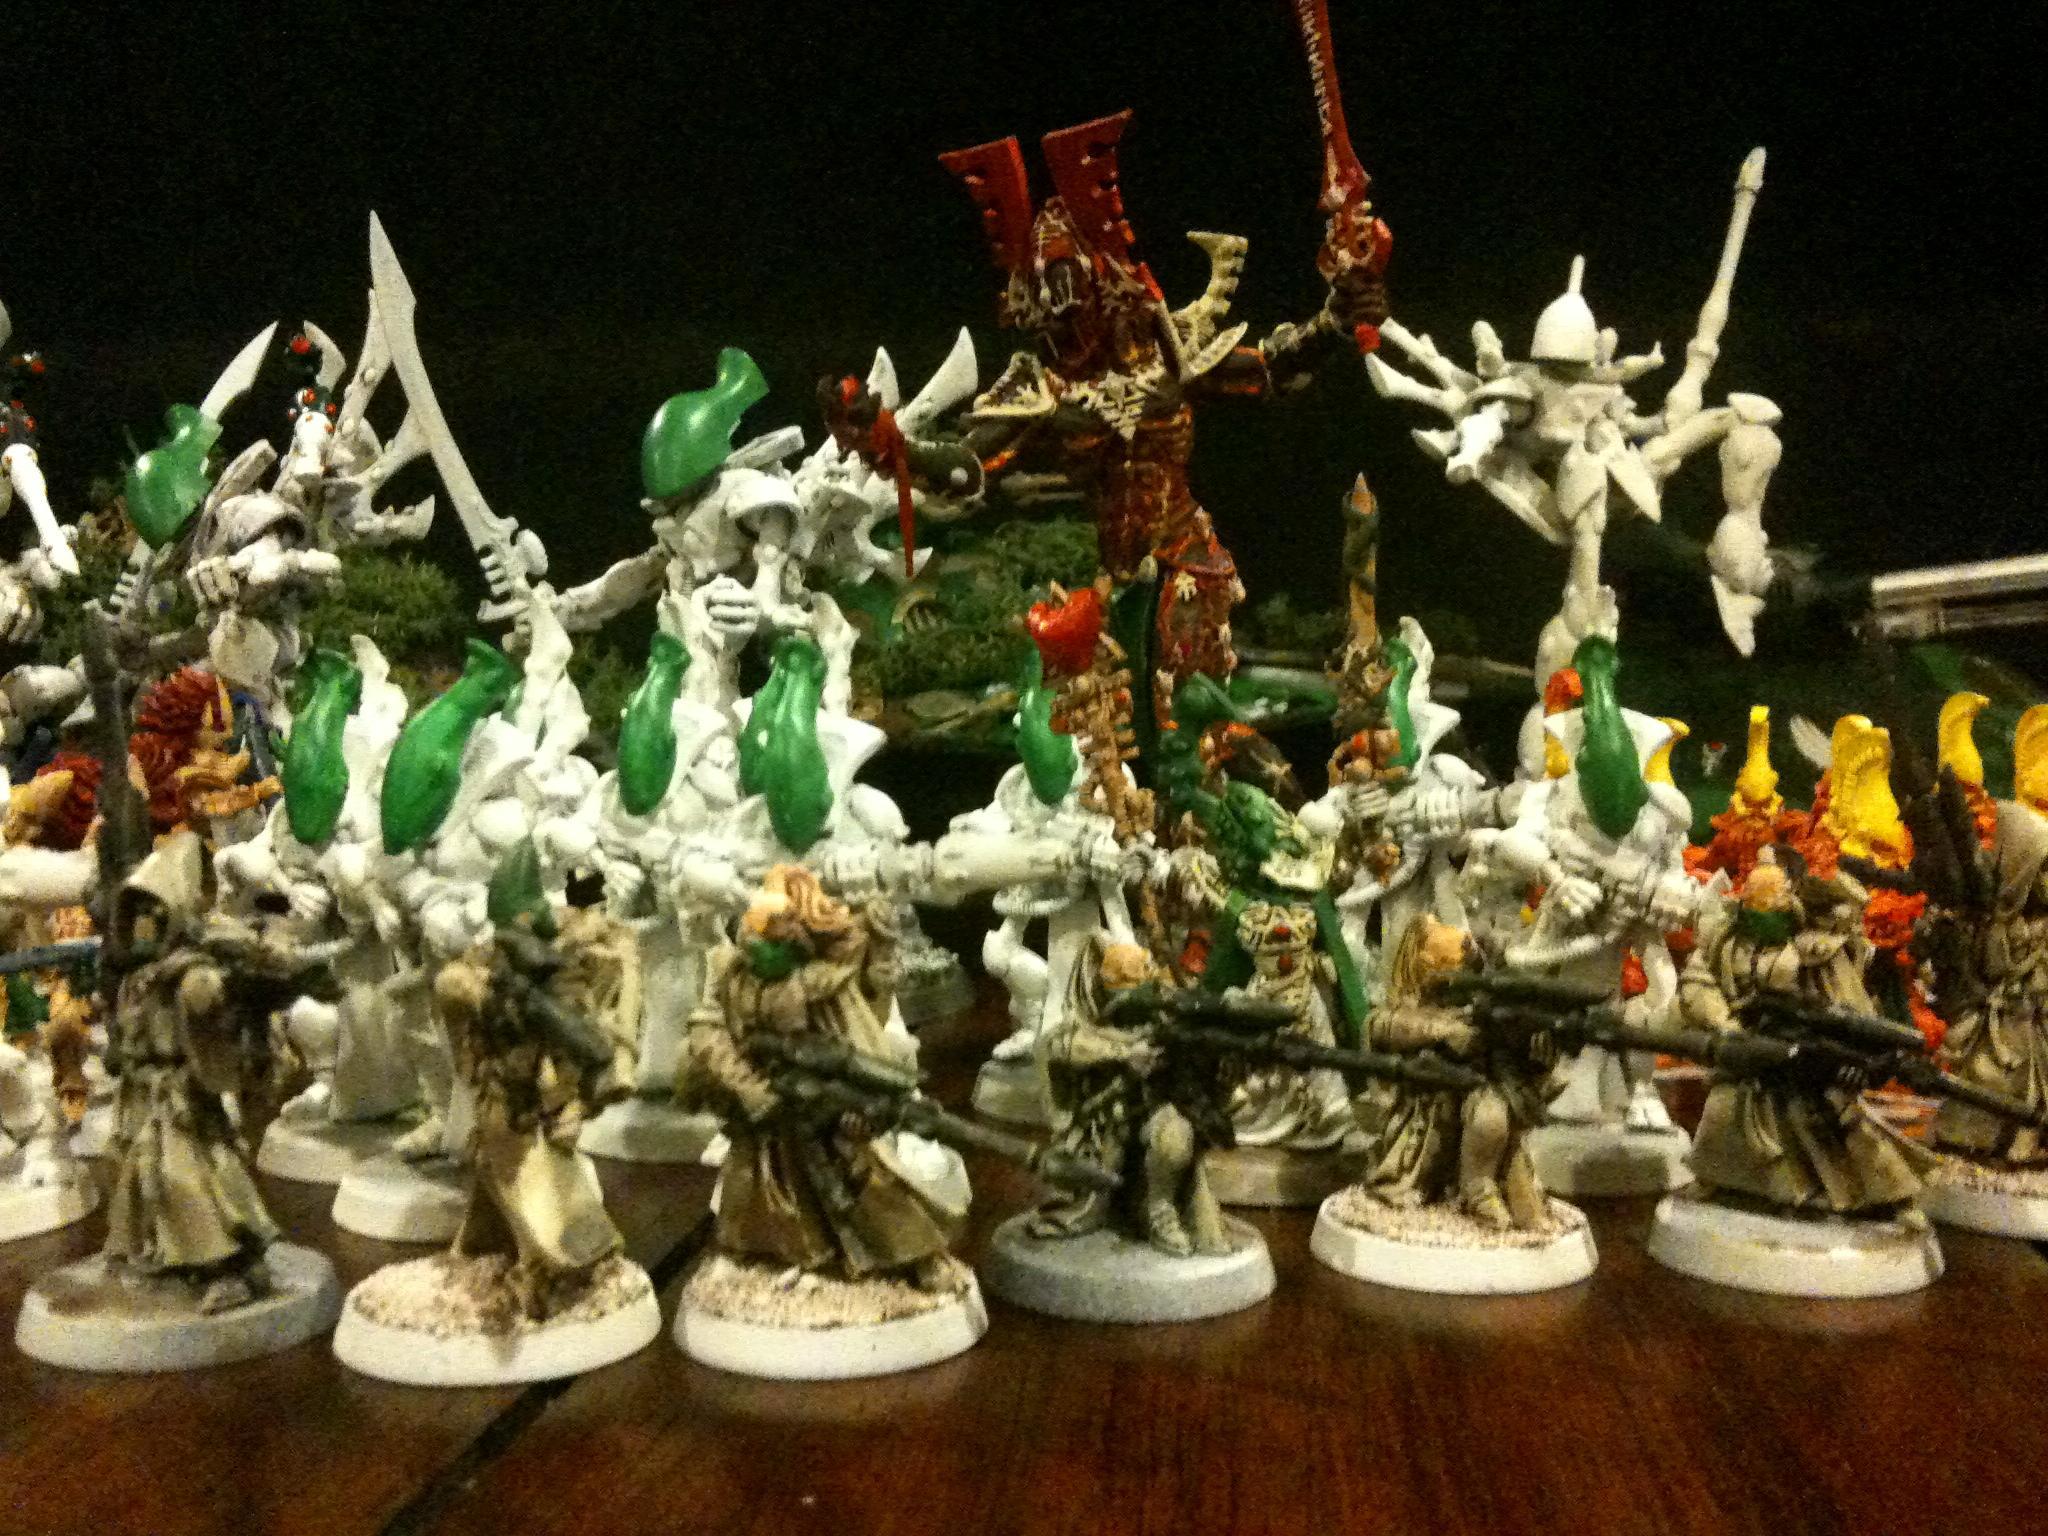 Avatar, Eldar, Farseer, Fire Dragon, Pathfinders, Rangers, Wraithguard, Wraithlord